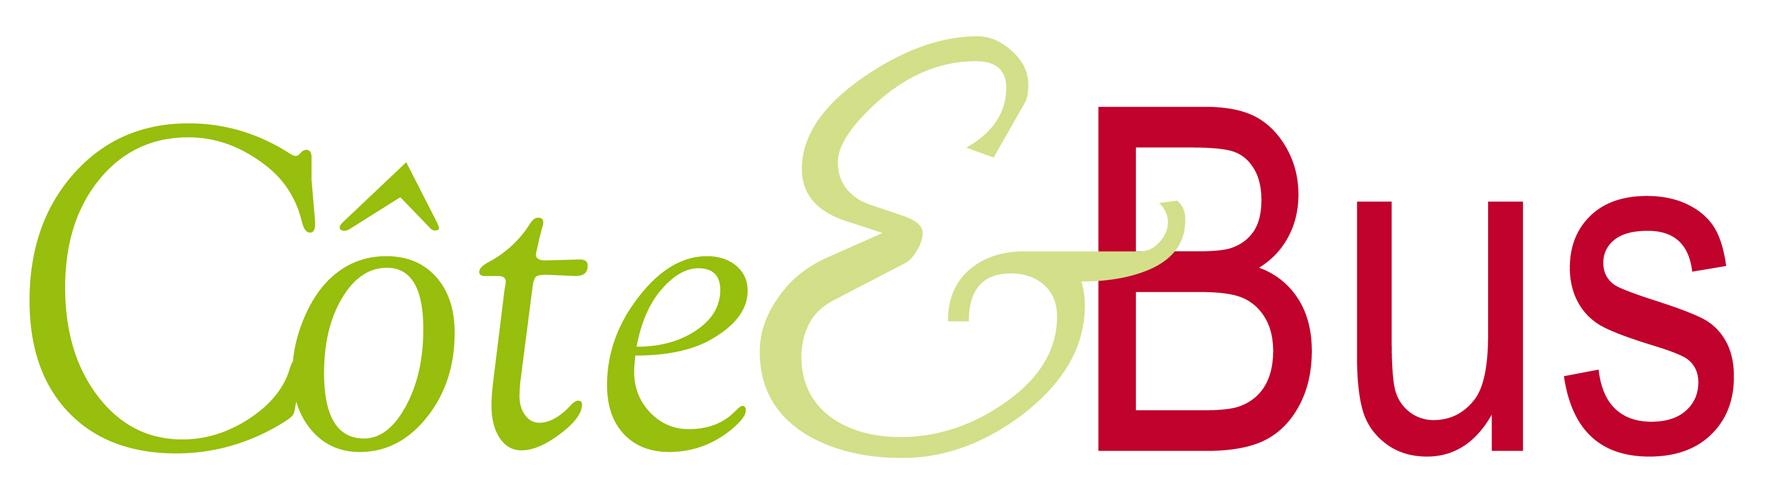 logo_cote_et_bus-2.jpg